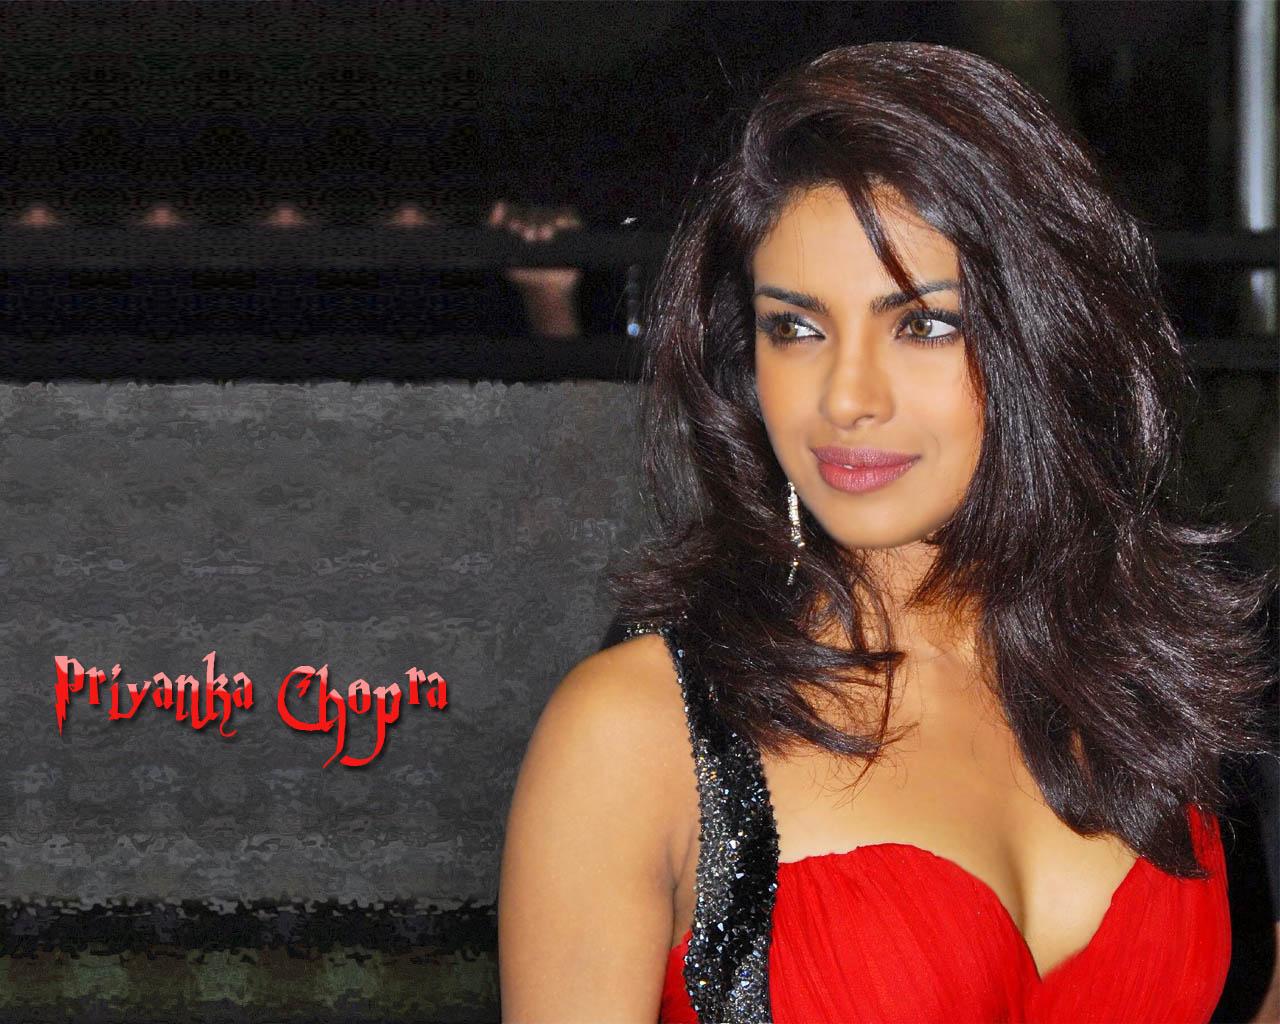 girls bollywood 2011: Priyanka Chopra Latest Unseen Photo ...